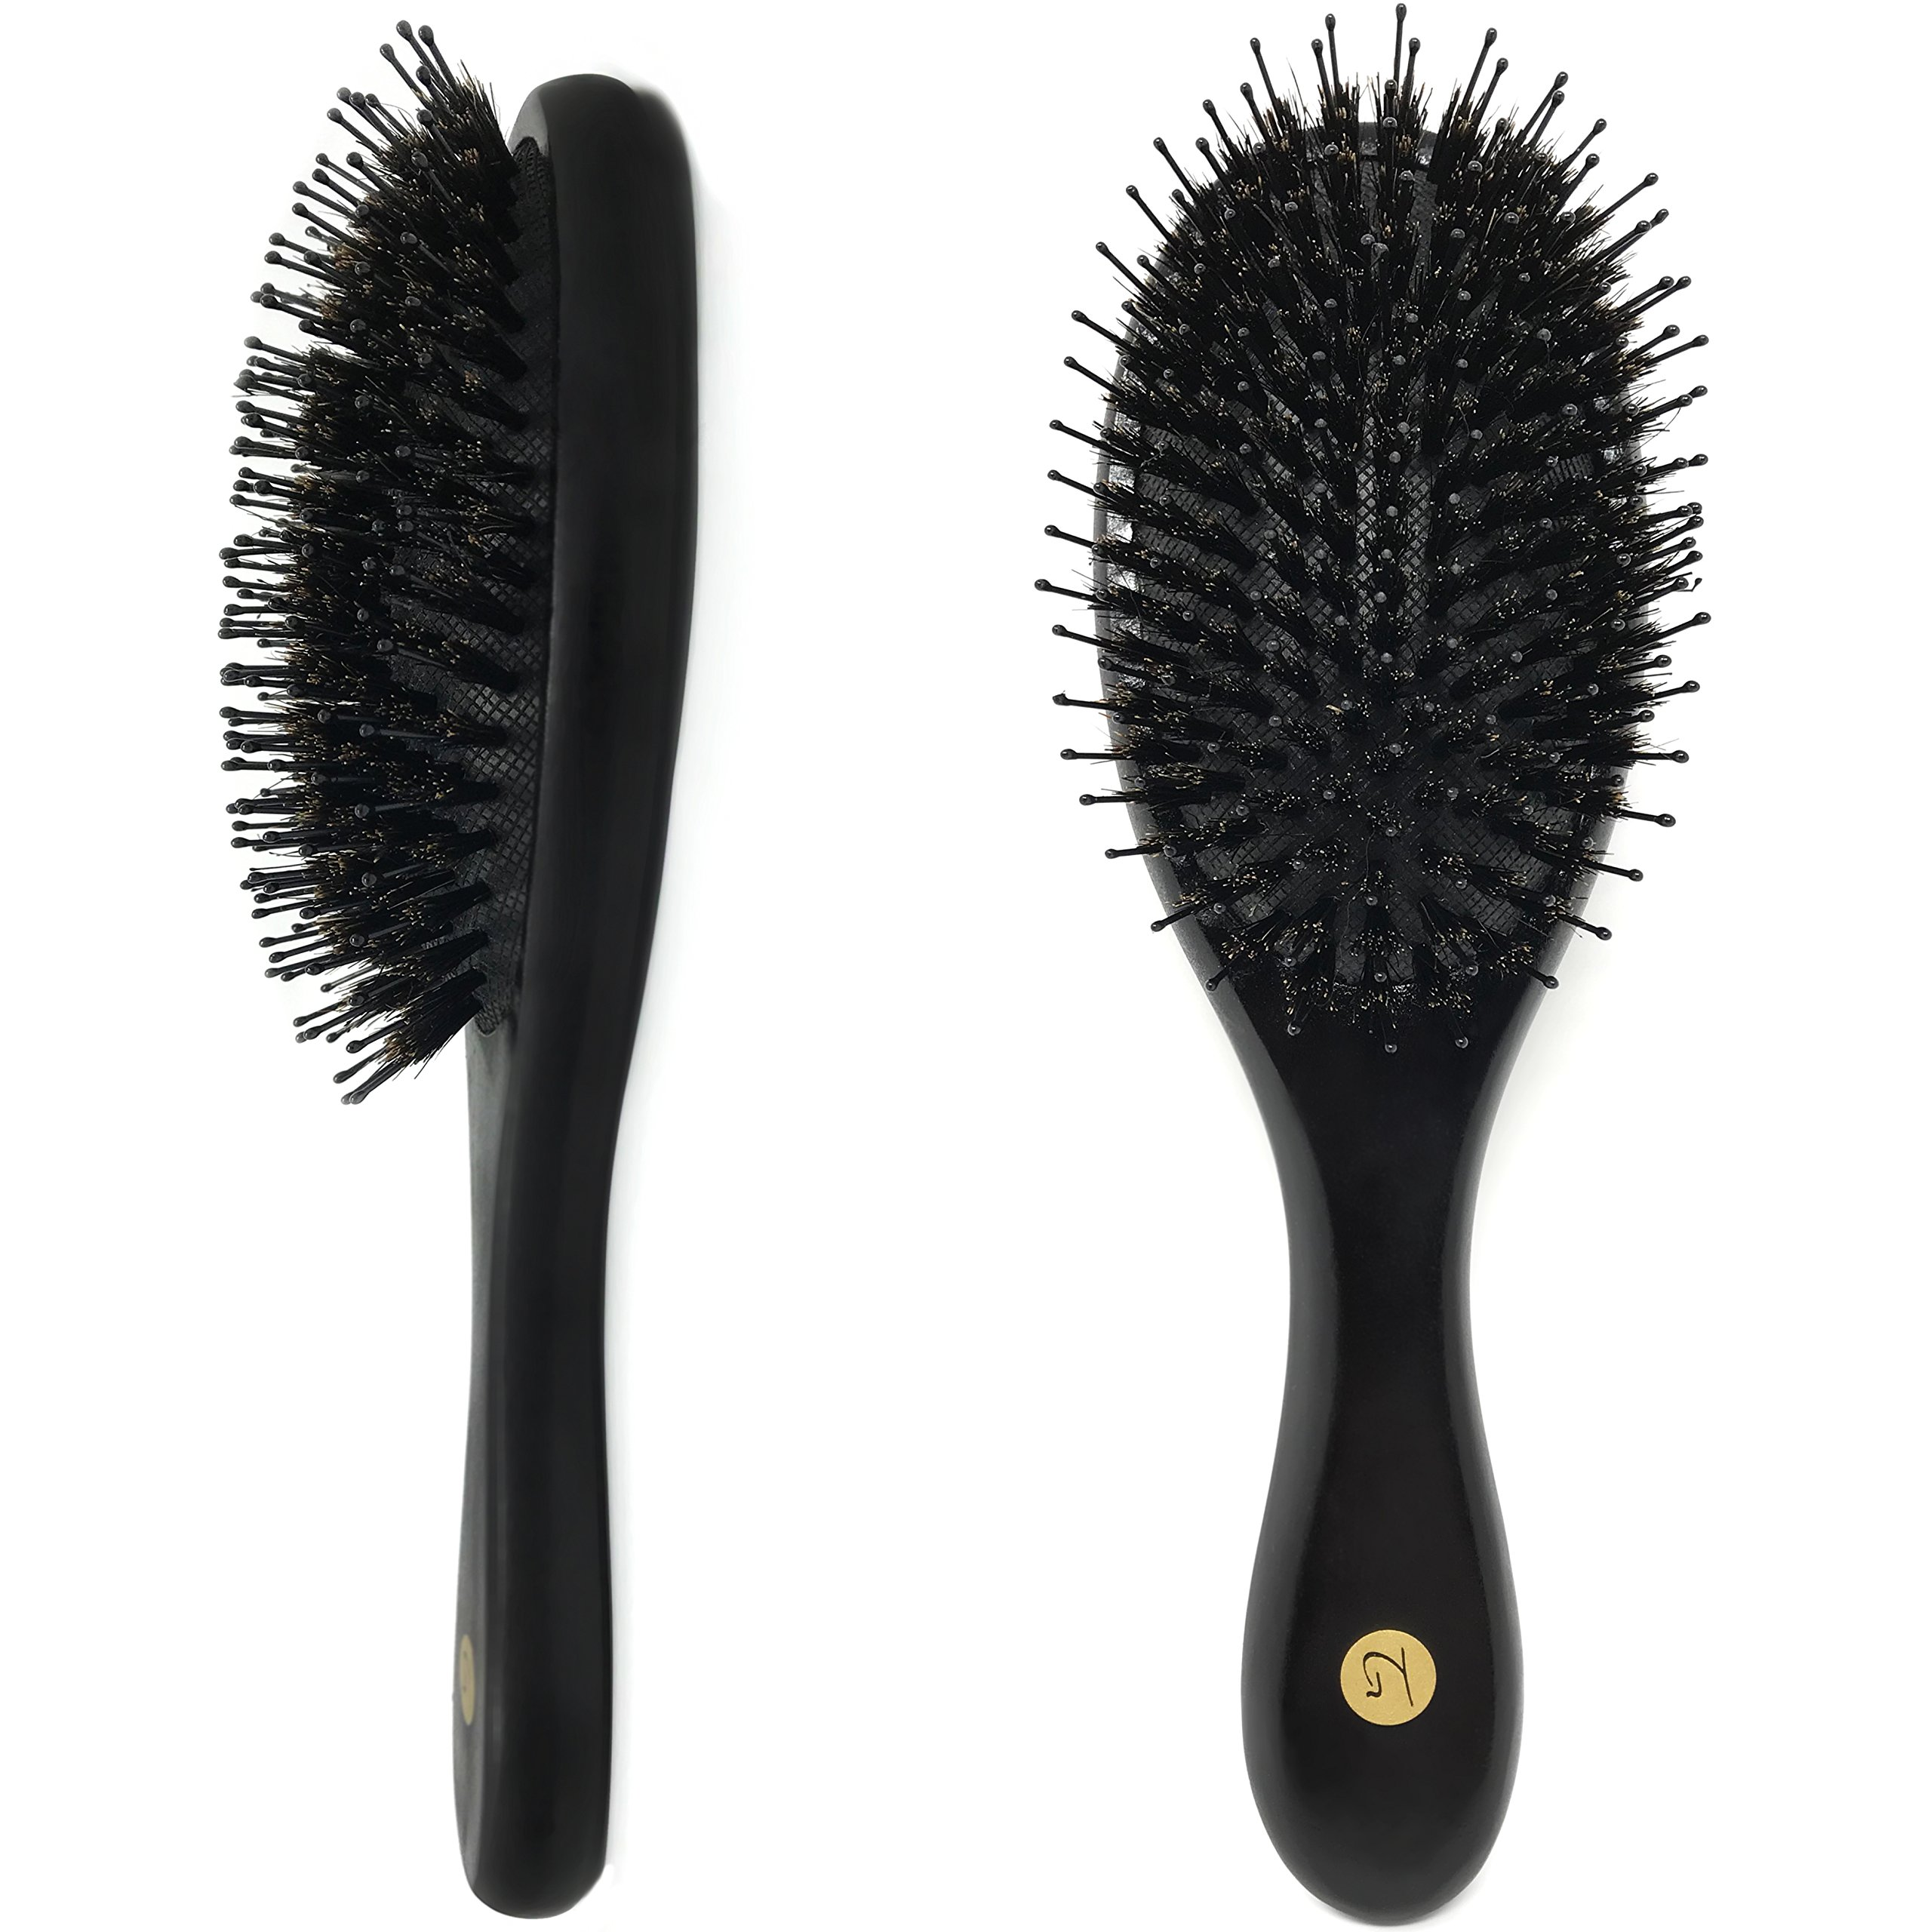 Hair Brush - Natural Boar Bristle Hair Brush for Men & Women with Added Nylon Pins and Ball Tips for Optimal Detangling & Scalp Stimulation - Large Paddle Hairbrush for Adding Shine | All Hair Types